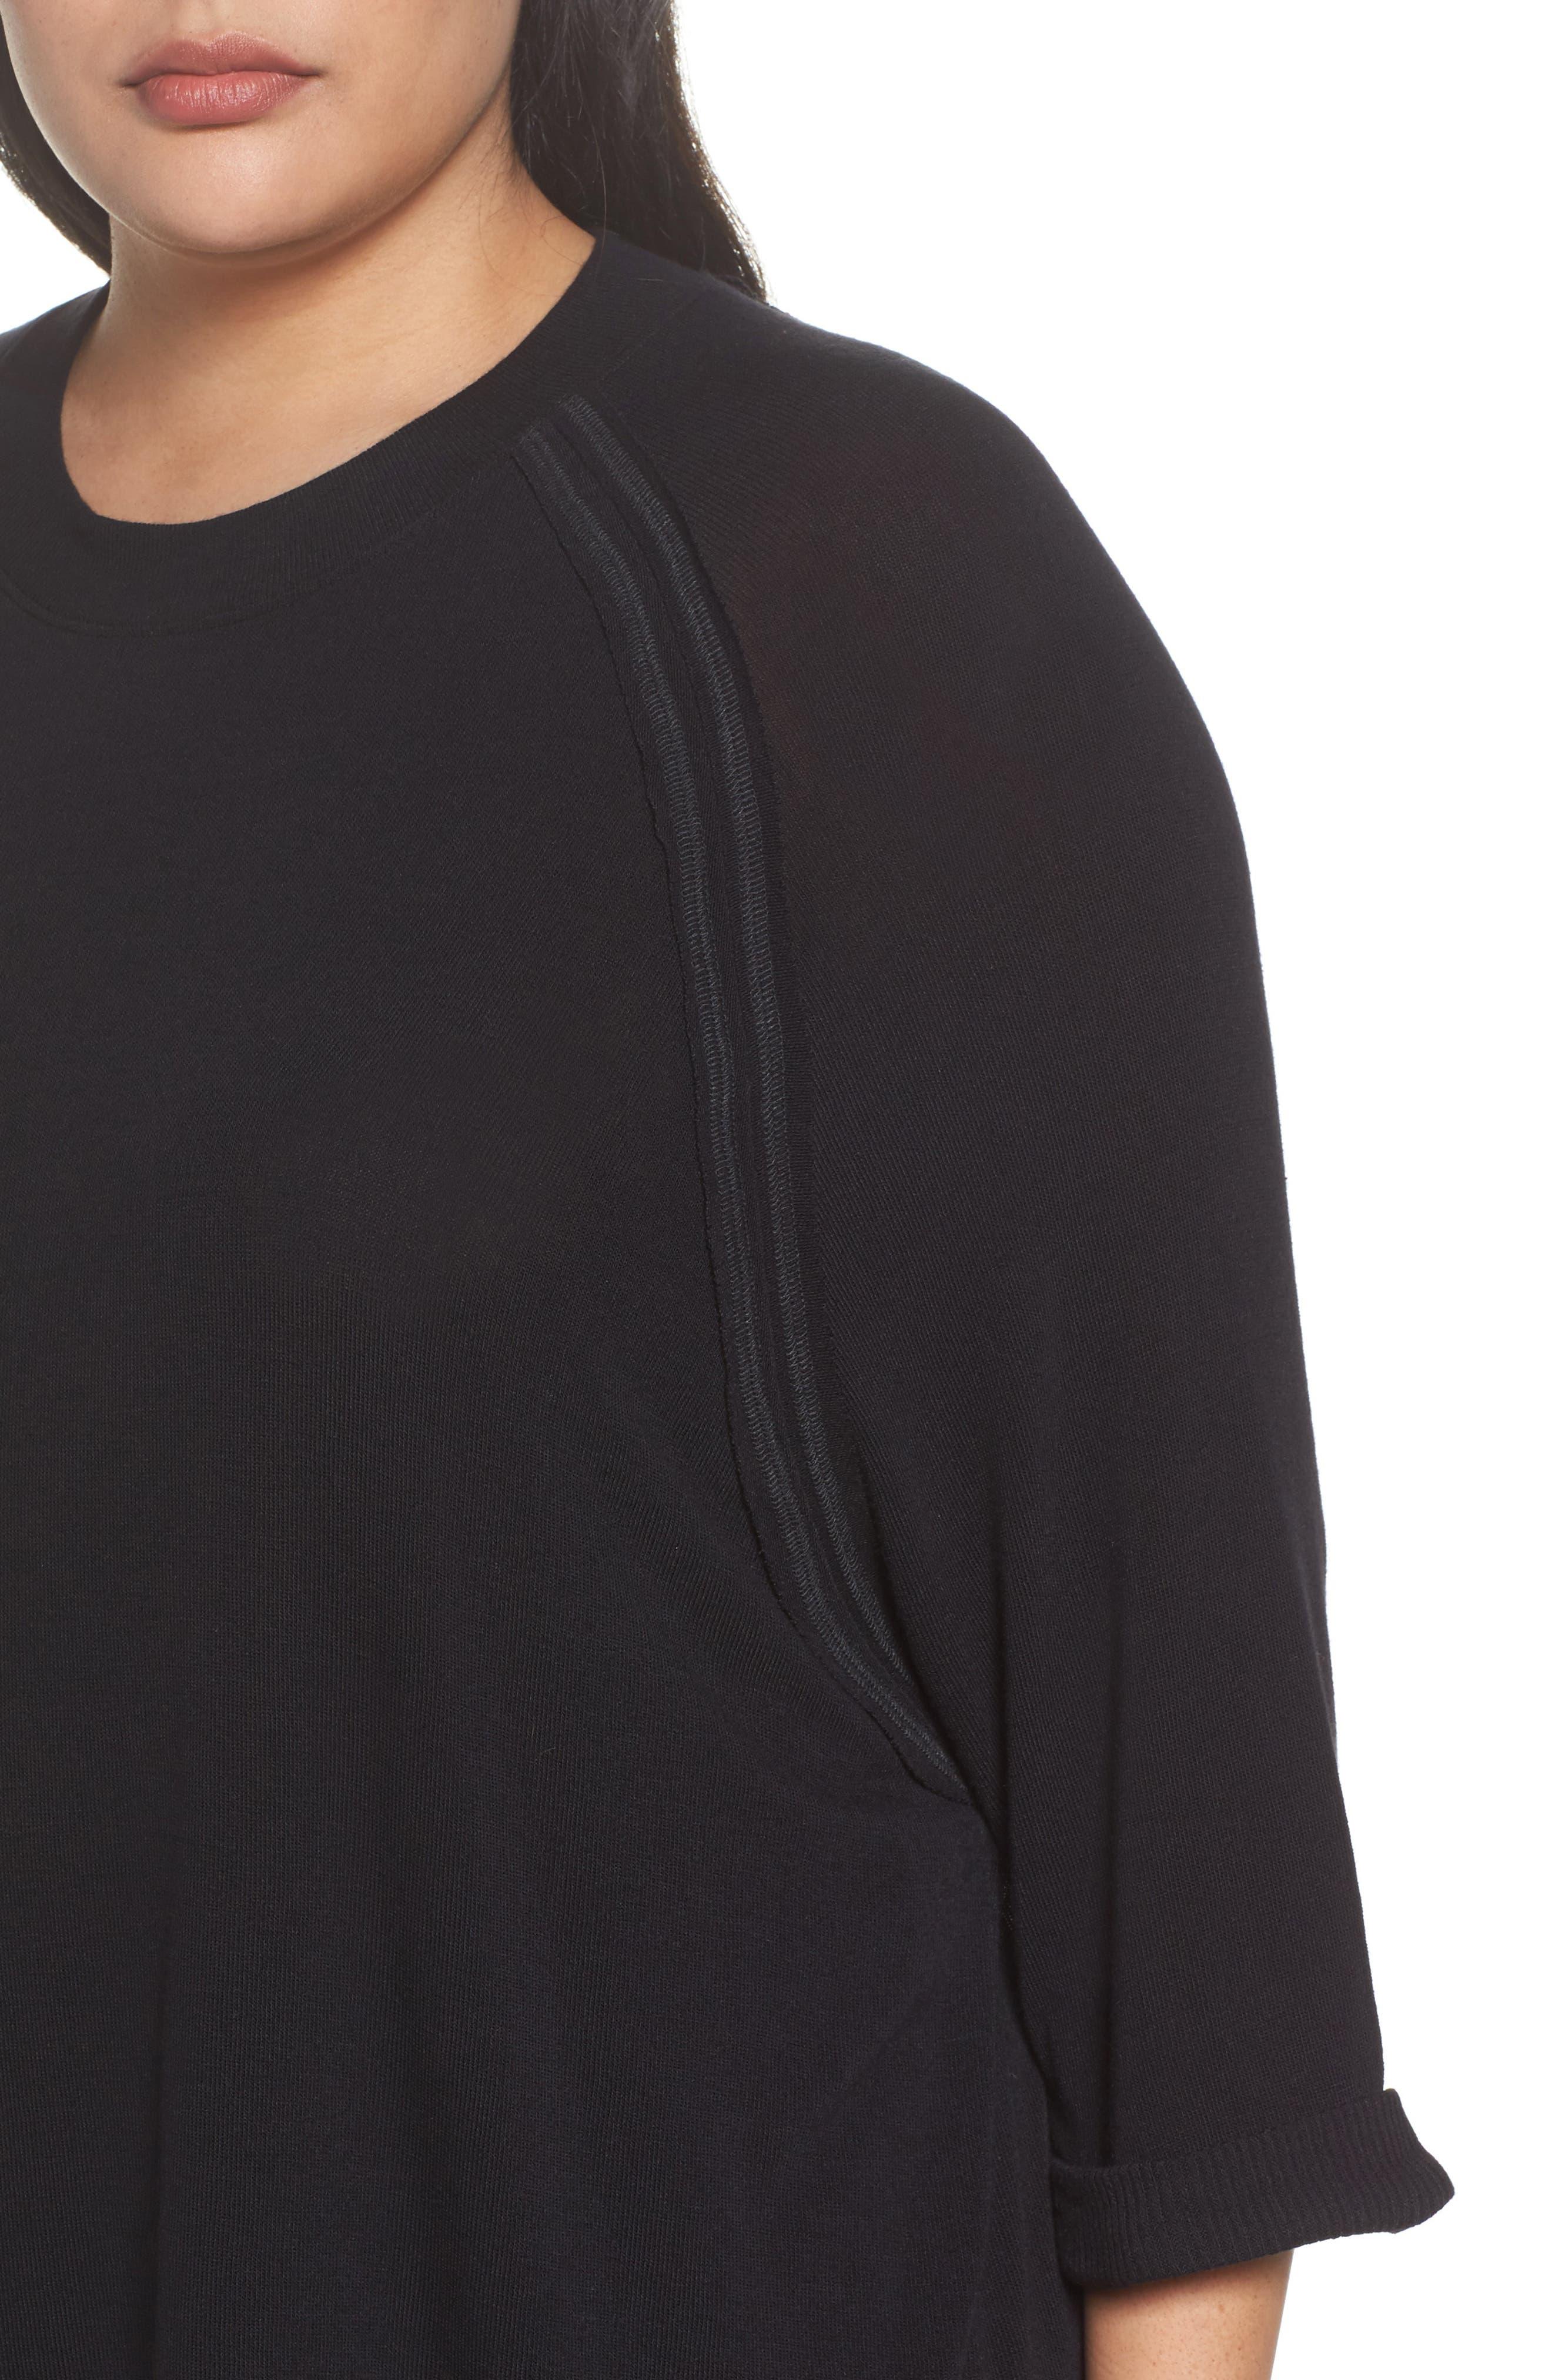 Stitch Detail Pullover,                             Alternate thumbnail 4, color,                             Black